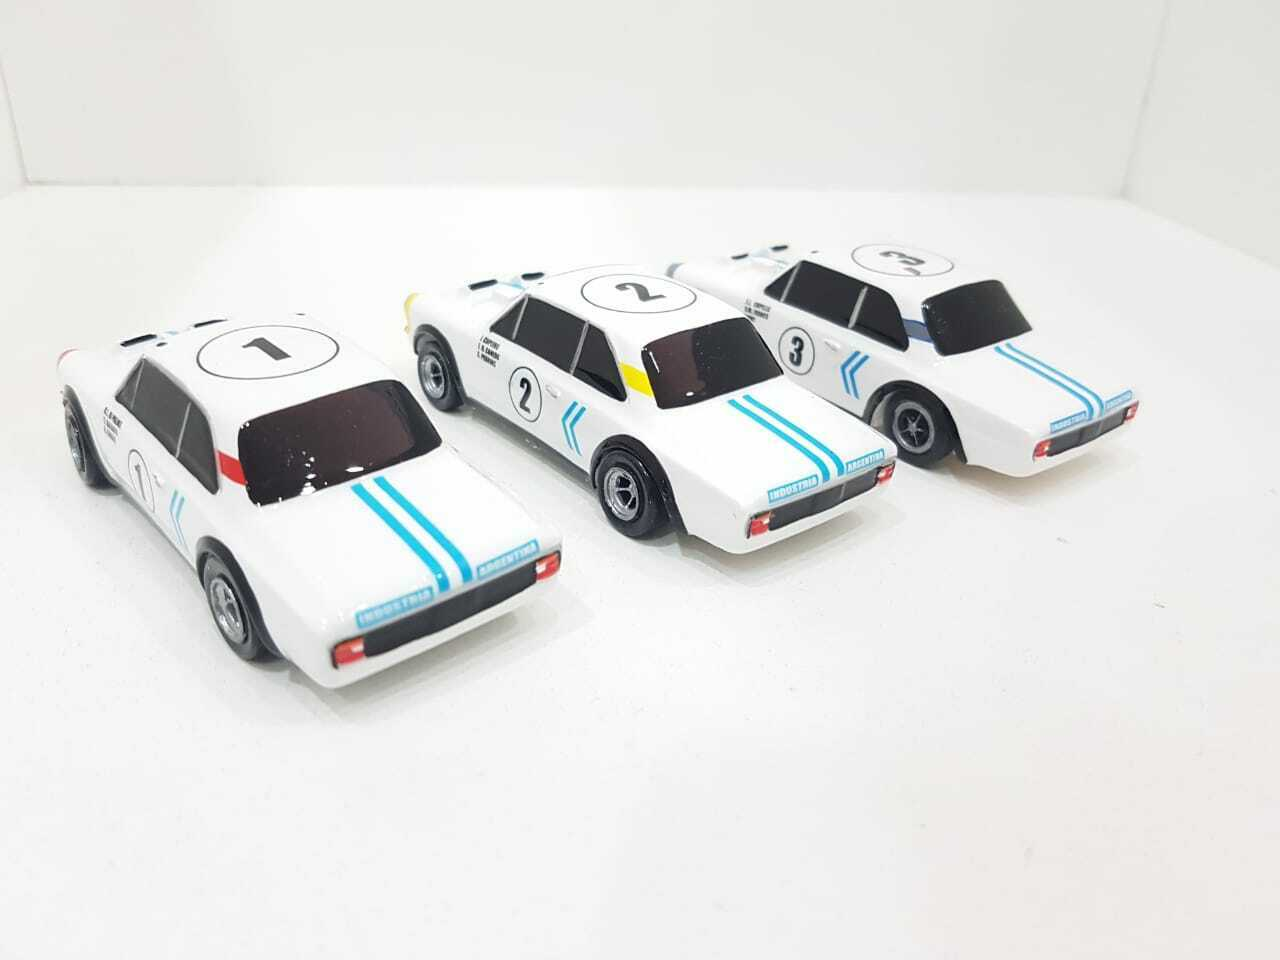 Set x3 x3 x3 renault torino 84hs nurburgring 1969 1 43 silverina mision fangio 473dea